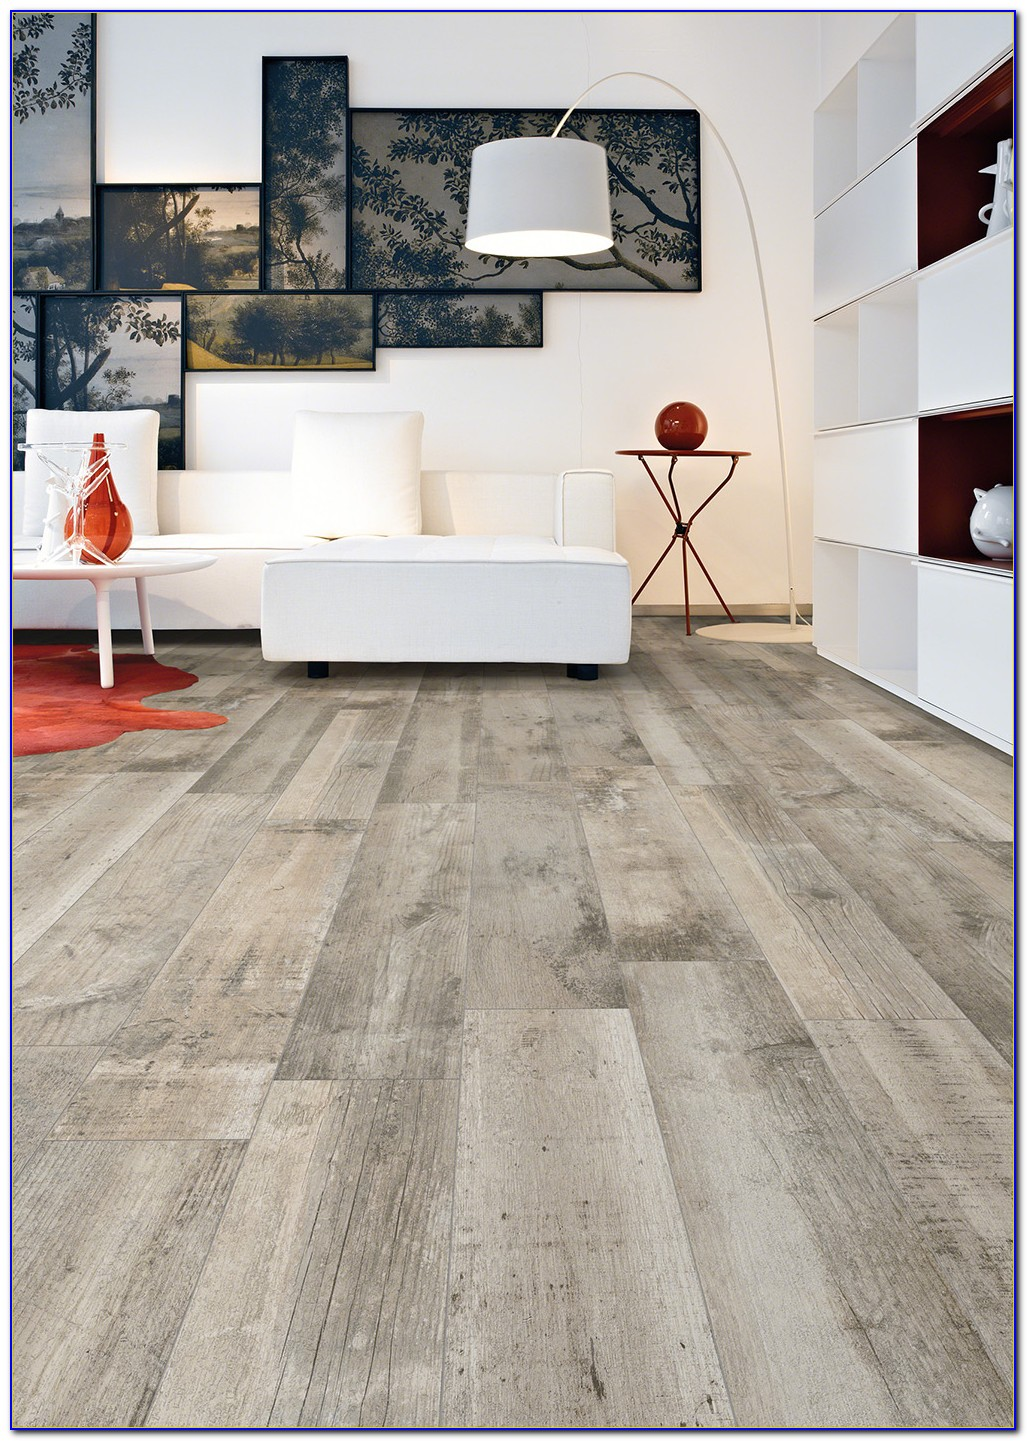 Light Grey Tile That Looks Like Wood